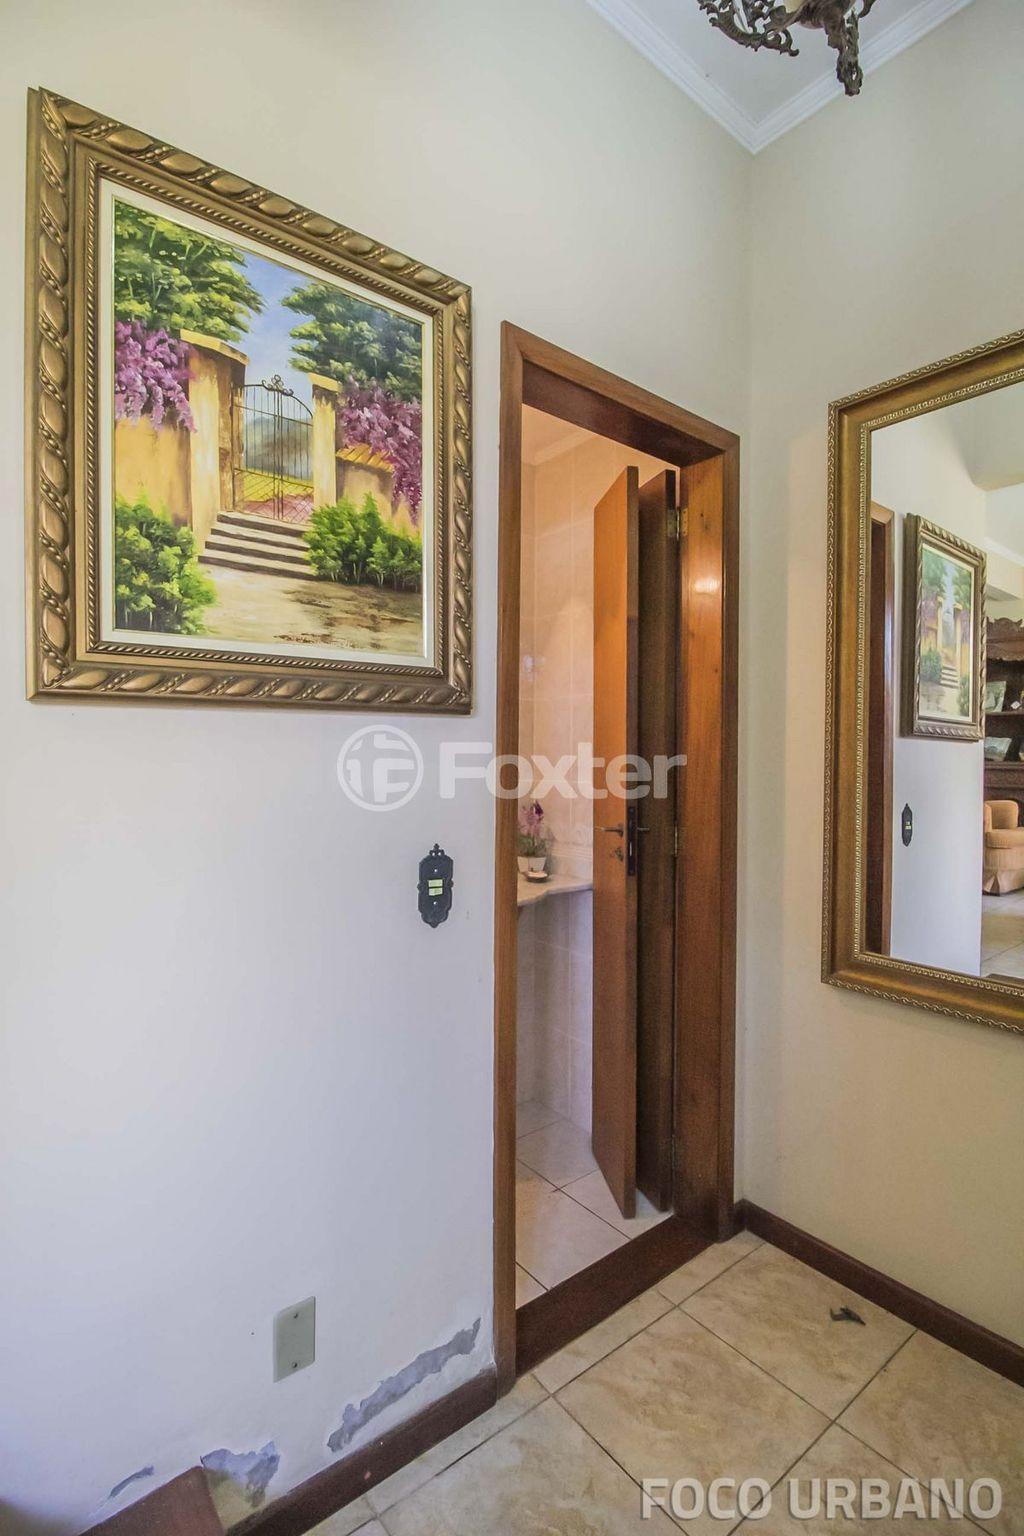 Casa 3 Dorm, Espírito Santo, Porto Alegre (127174) - Foto 34